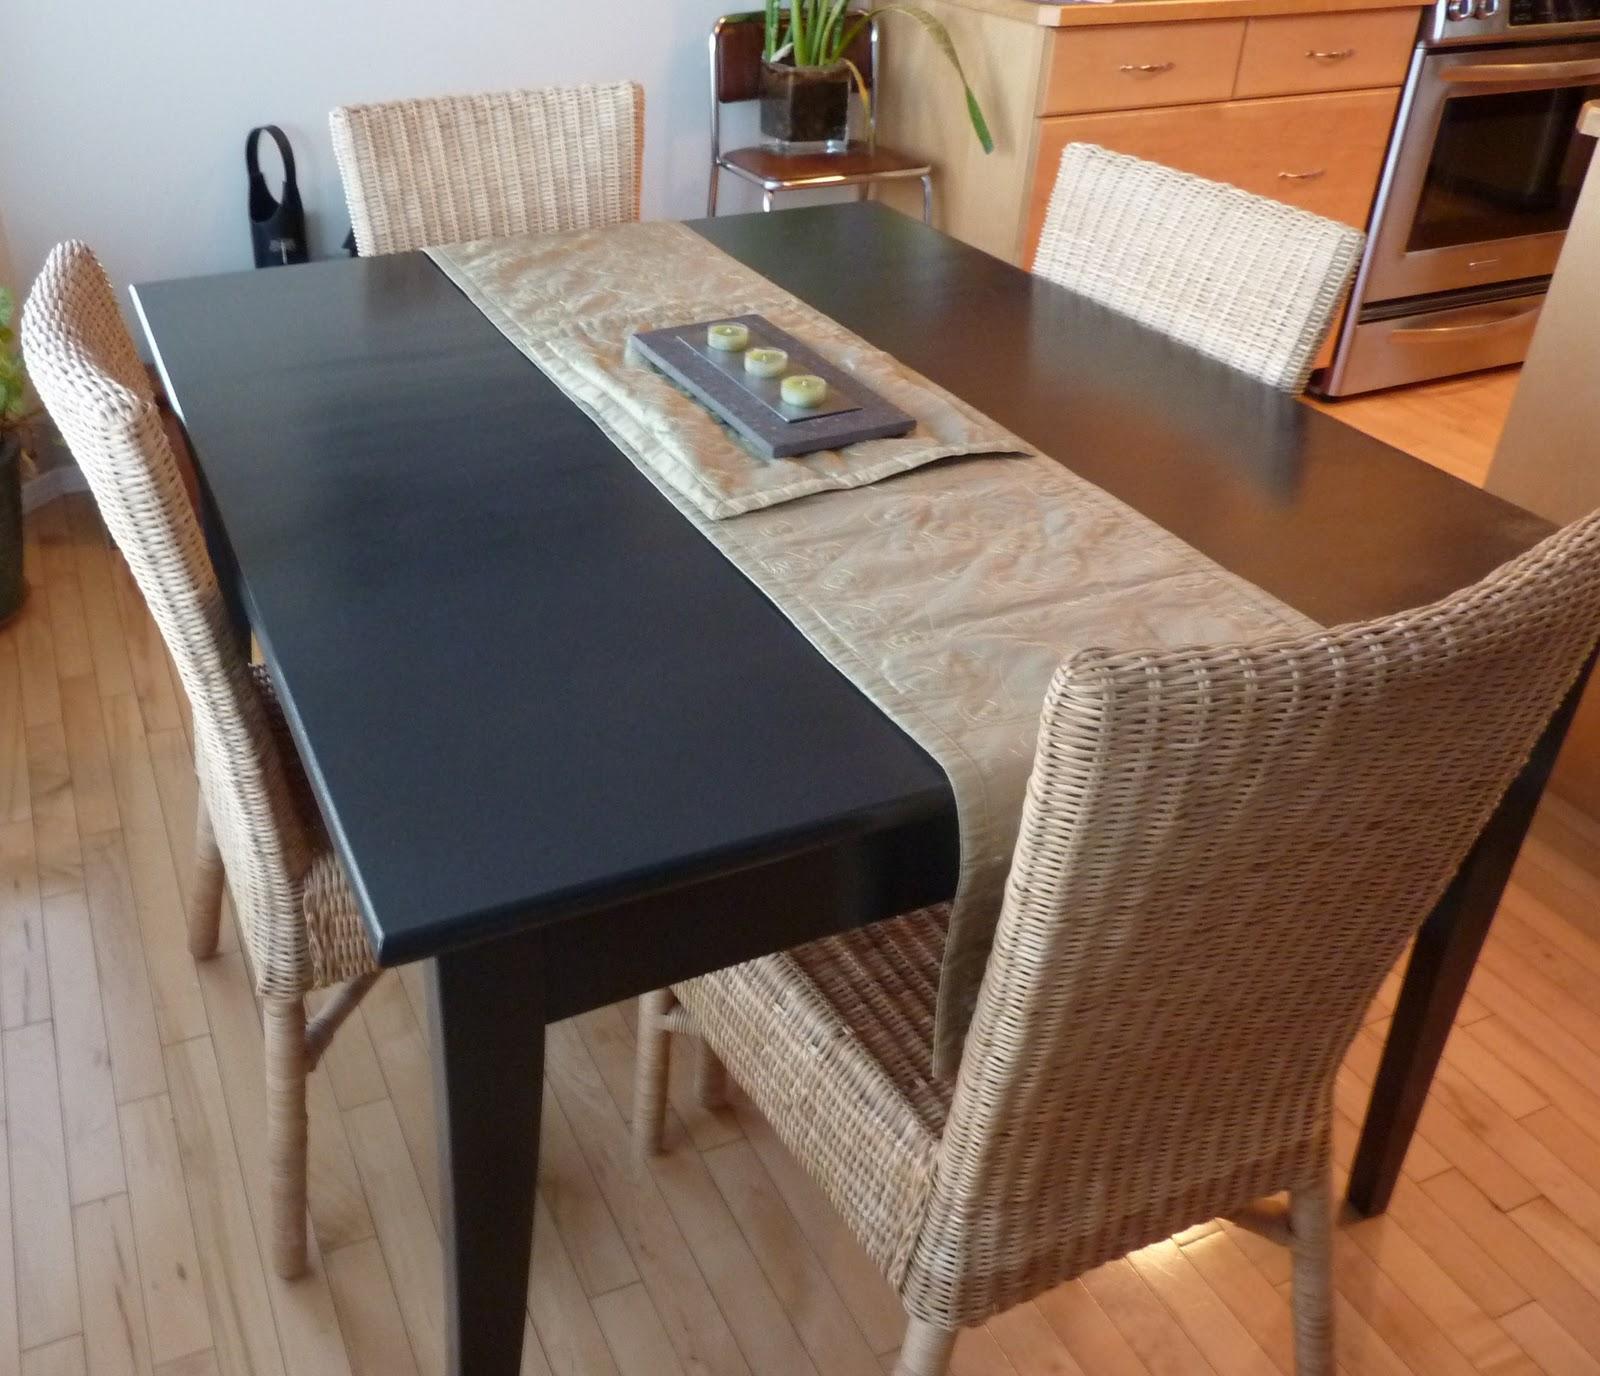 ikea furniture redo nook makeover redo kitchen table Ikea Furniture Redo Nook Makeover Our kitchen table